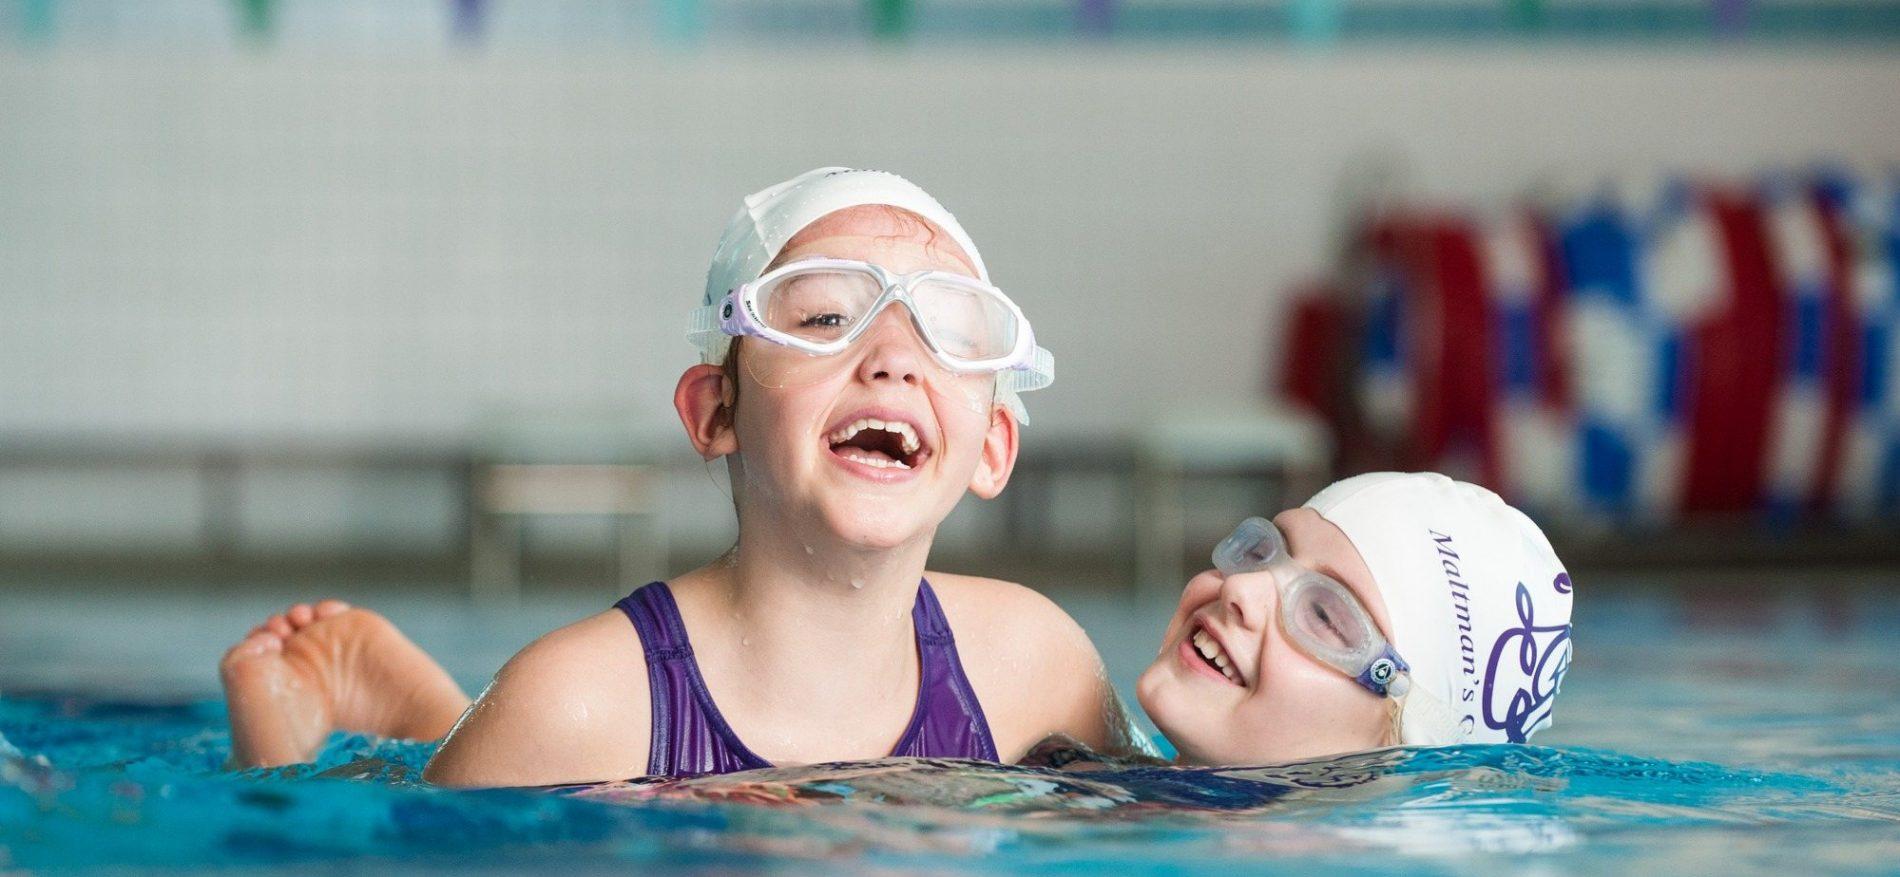 Swimming Lesson at School